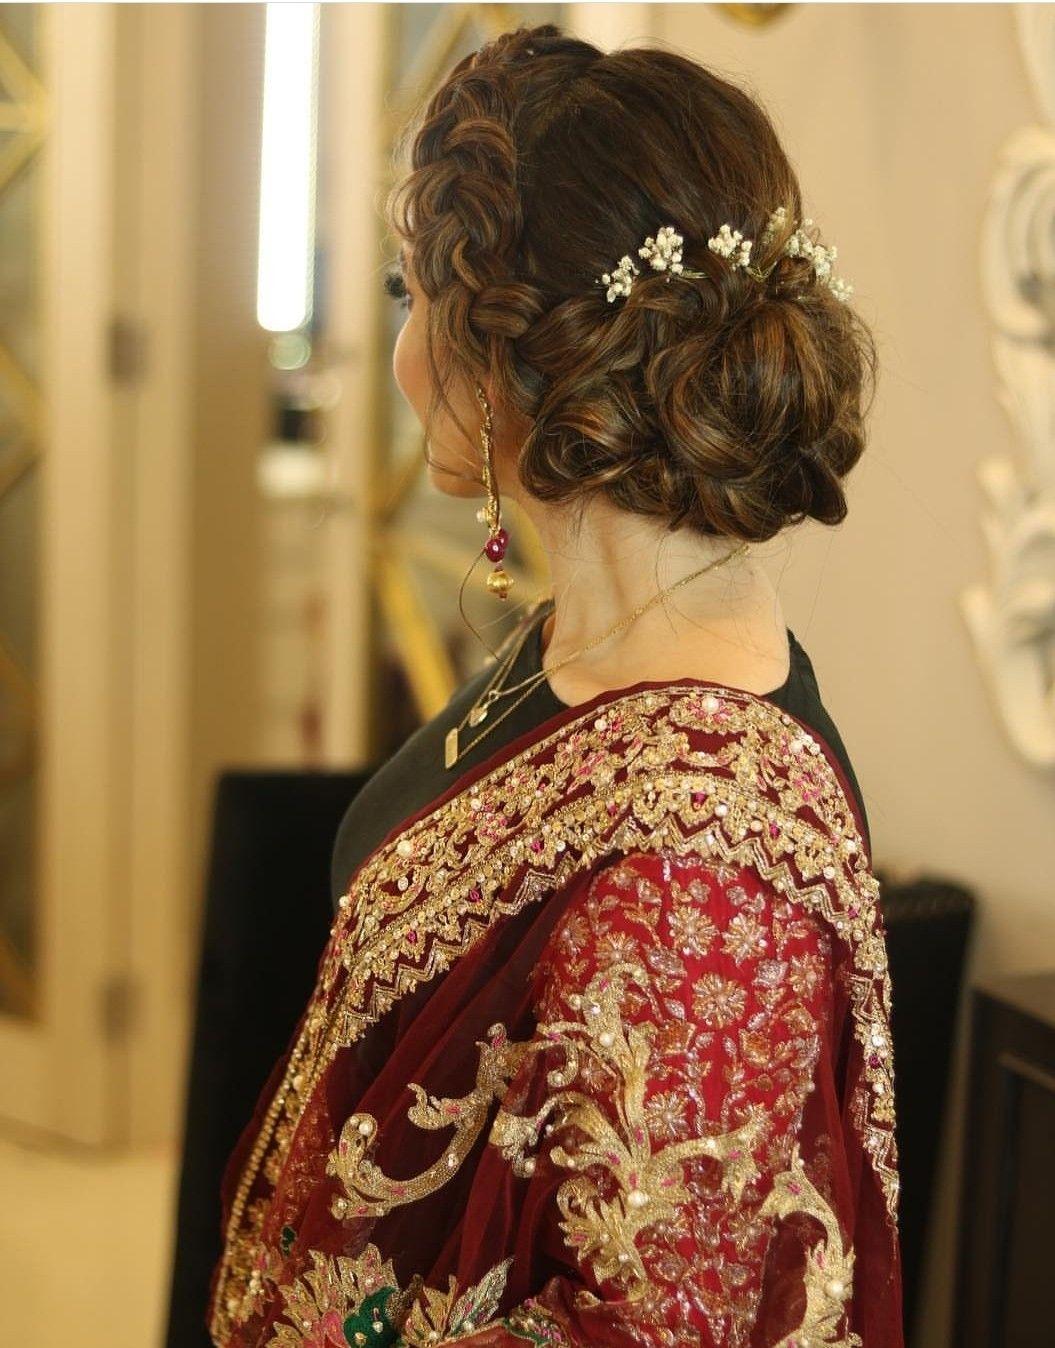 pin by pari zaaz on bridal wear in 2019 | bridal hair buns